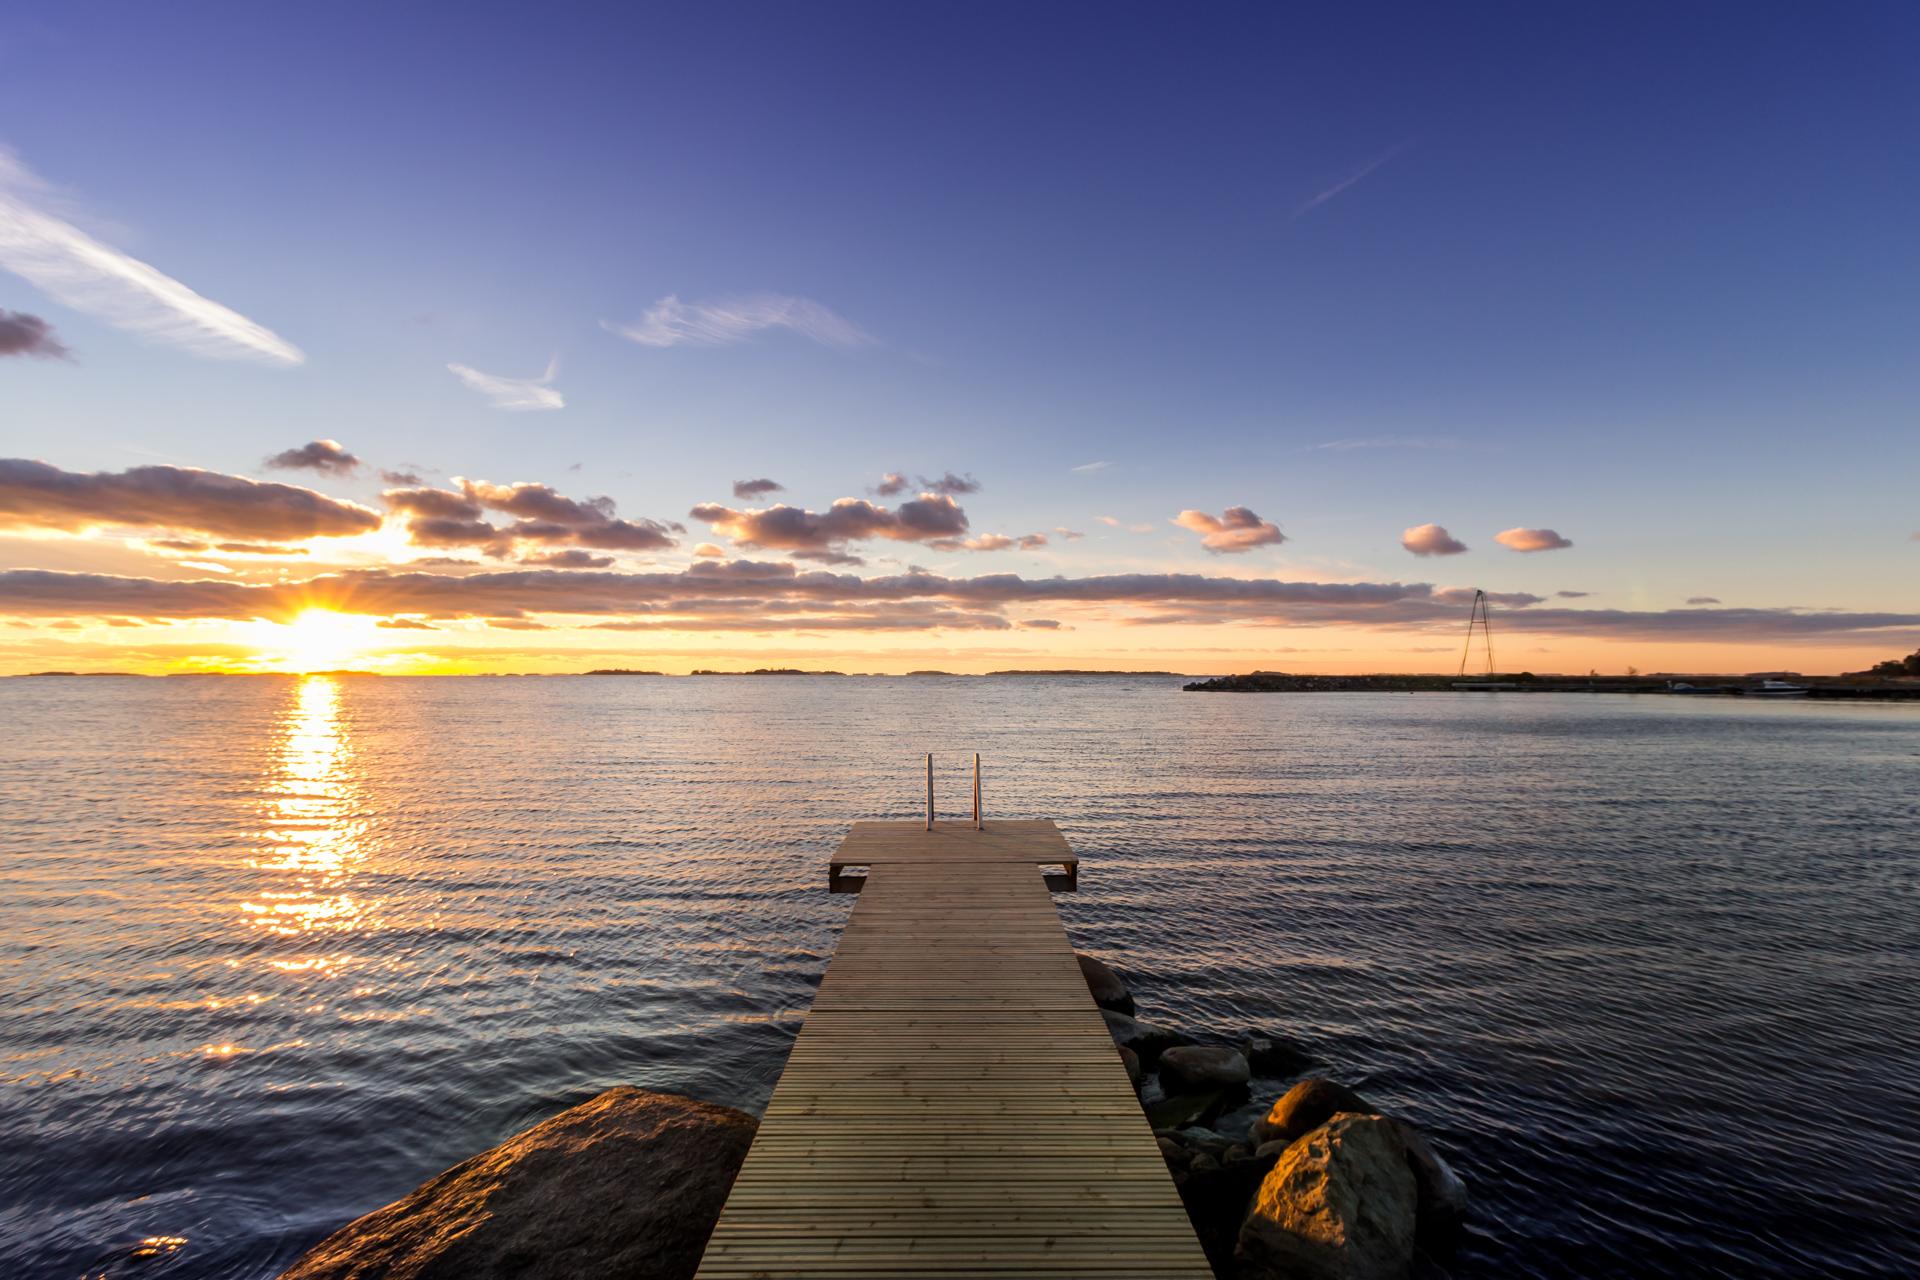 Hanko Finland October 2015